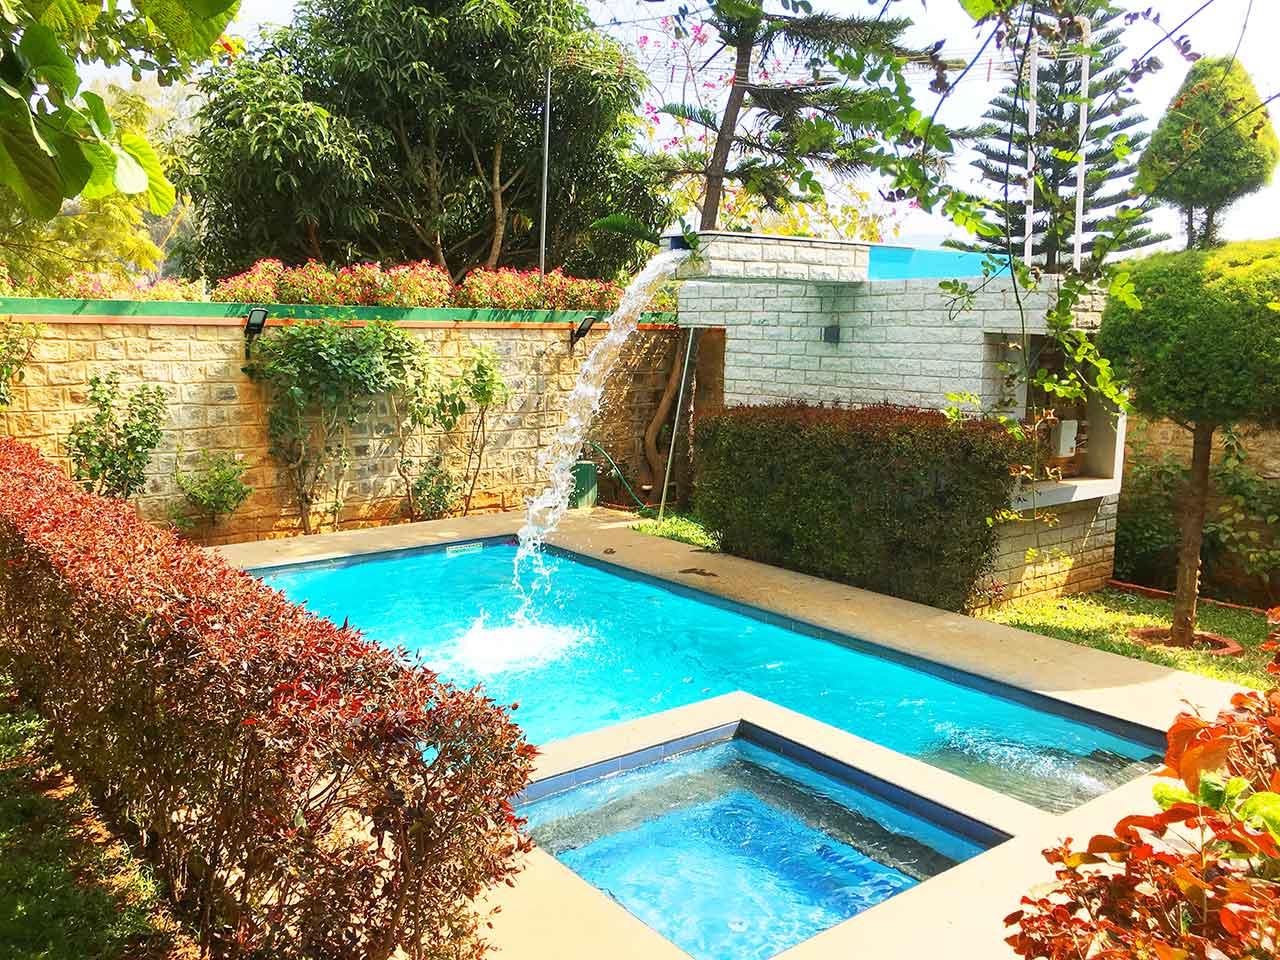 homestays with swimming pool in yelagiri hills